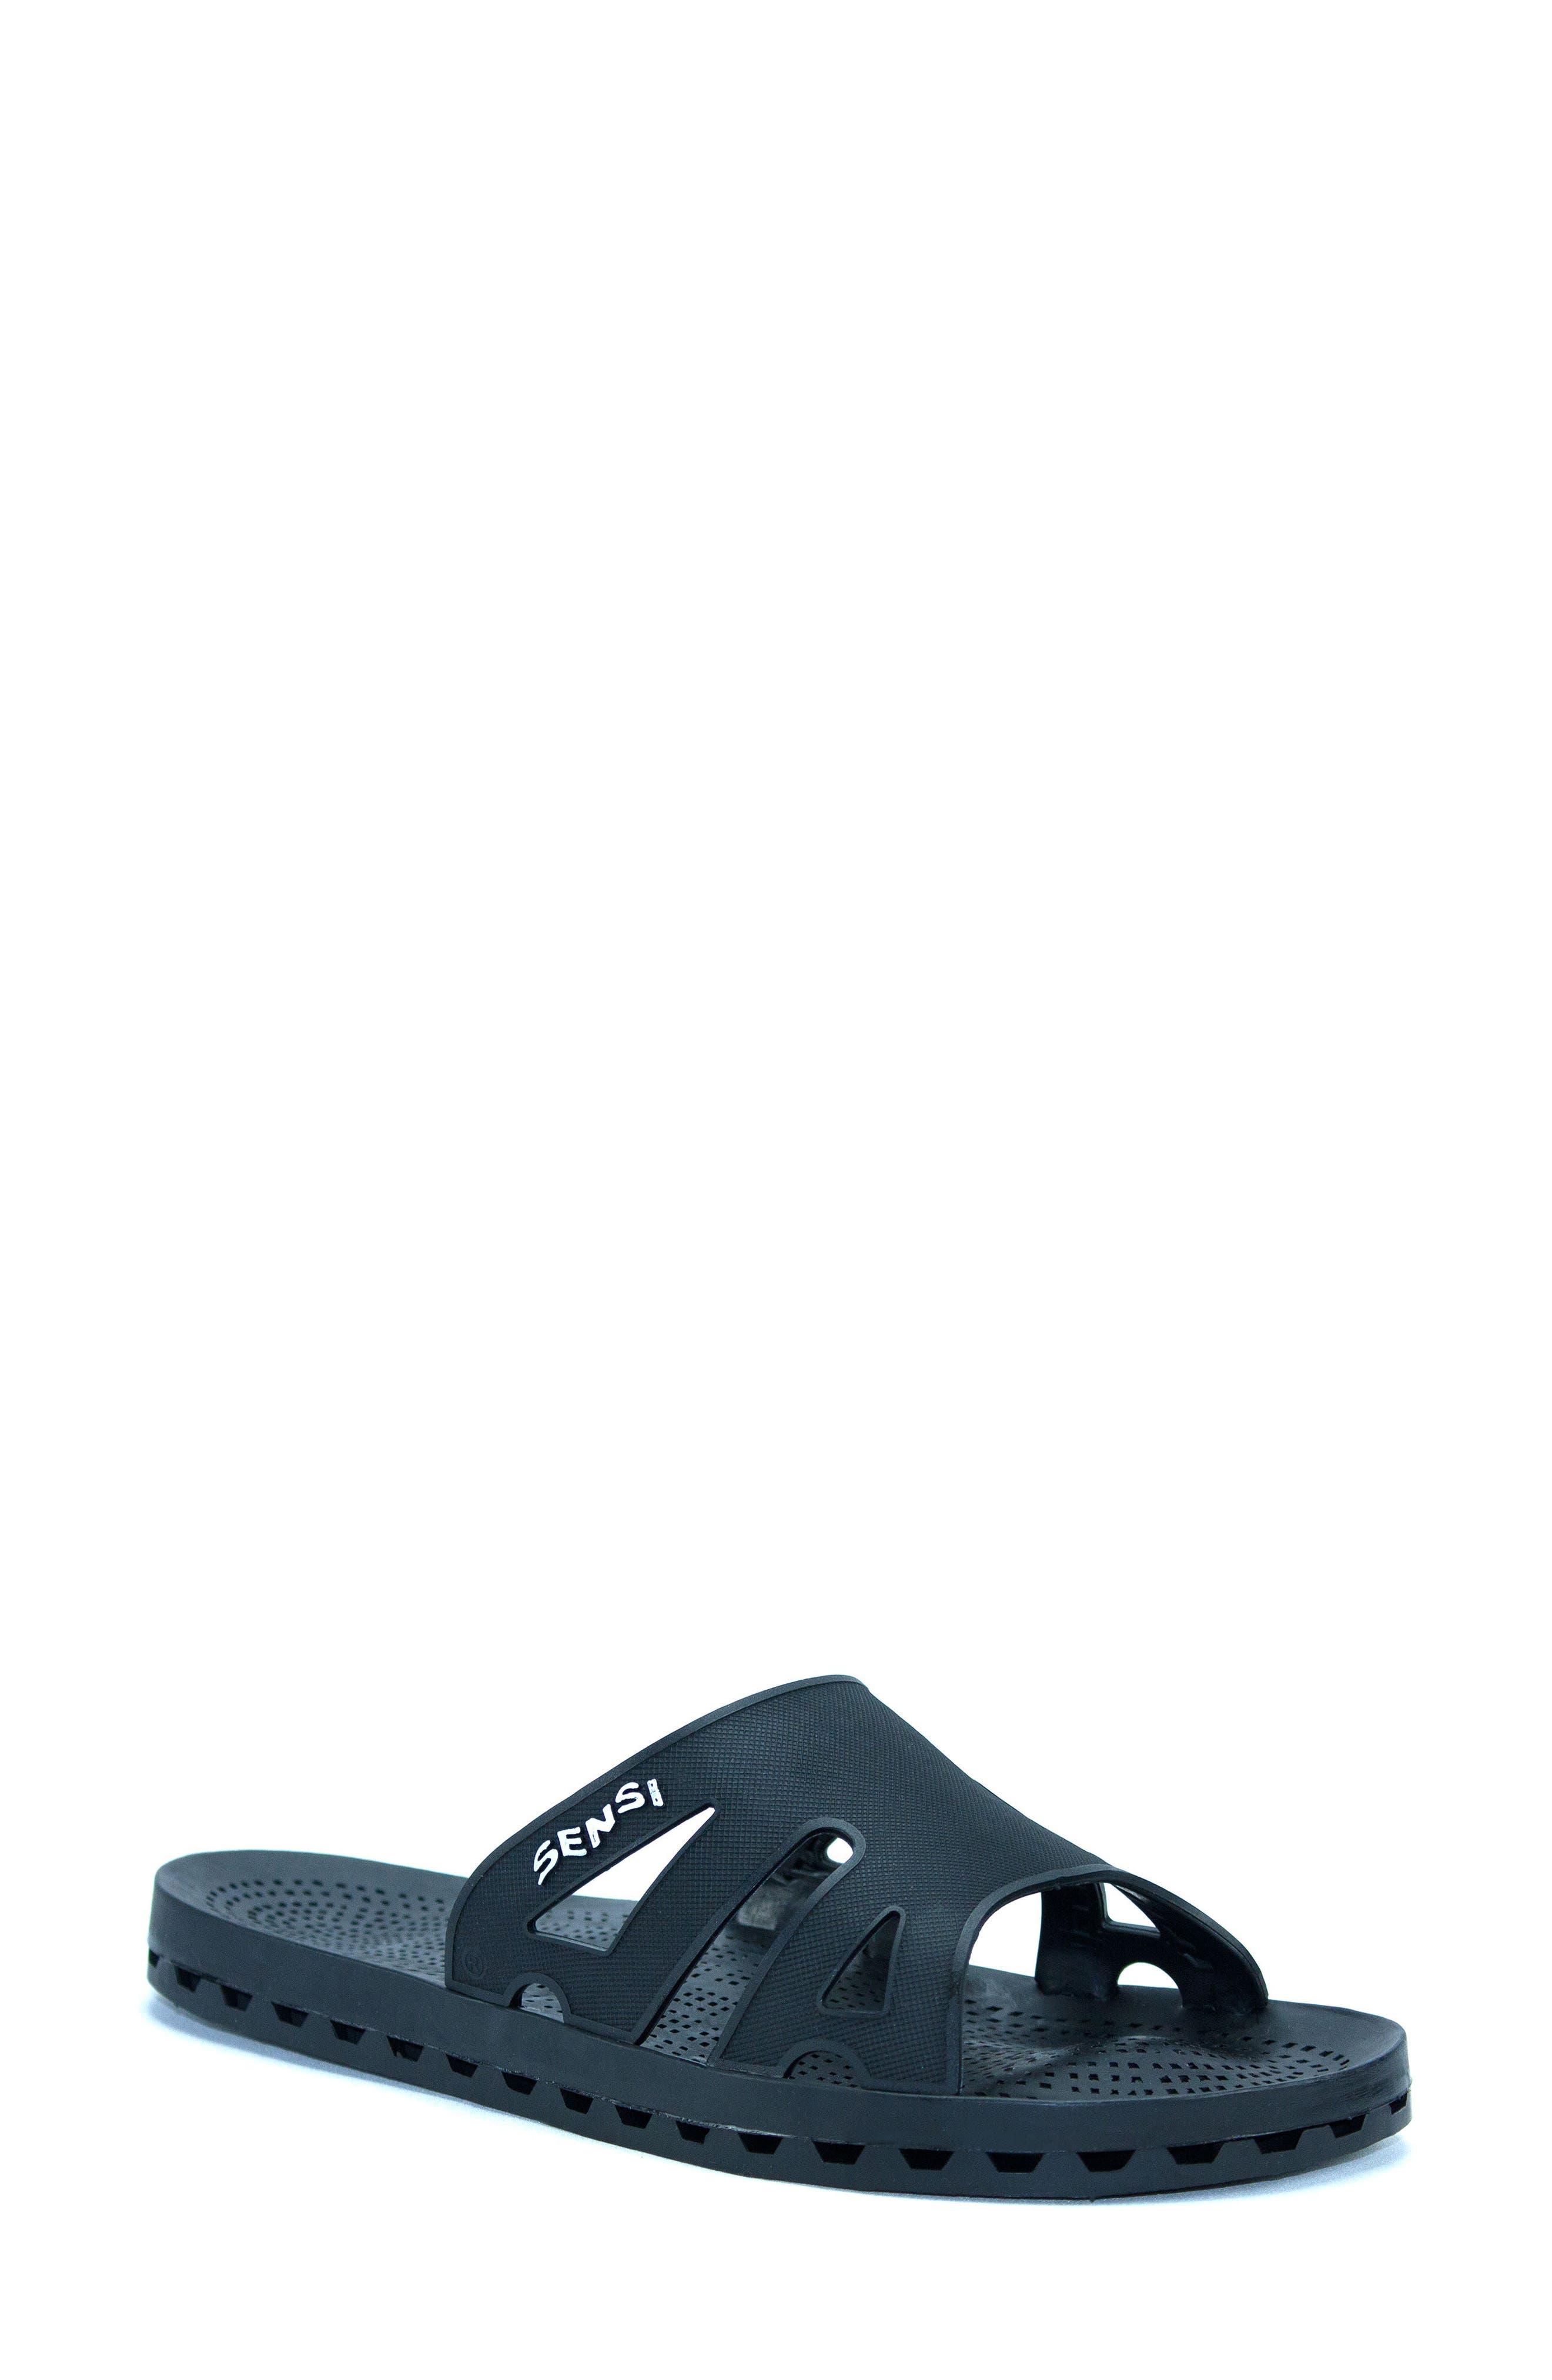 Regatta Slide Sandal,                             Main thumbnail 1, color,                             Solid Black Rubber